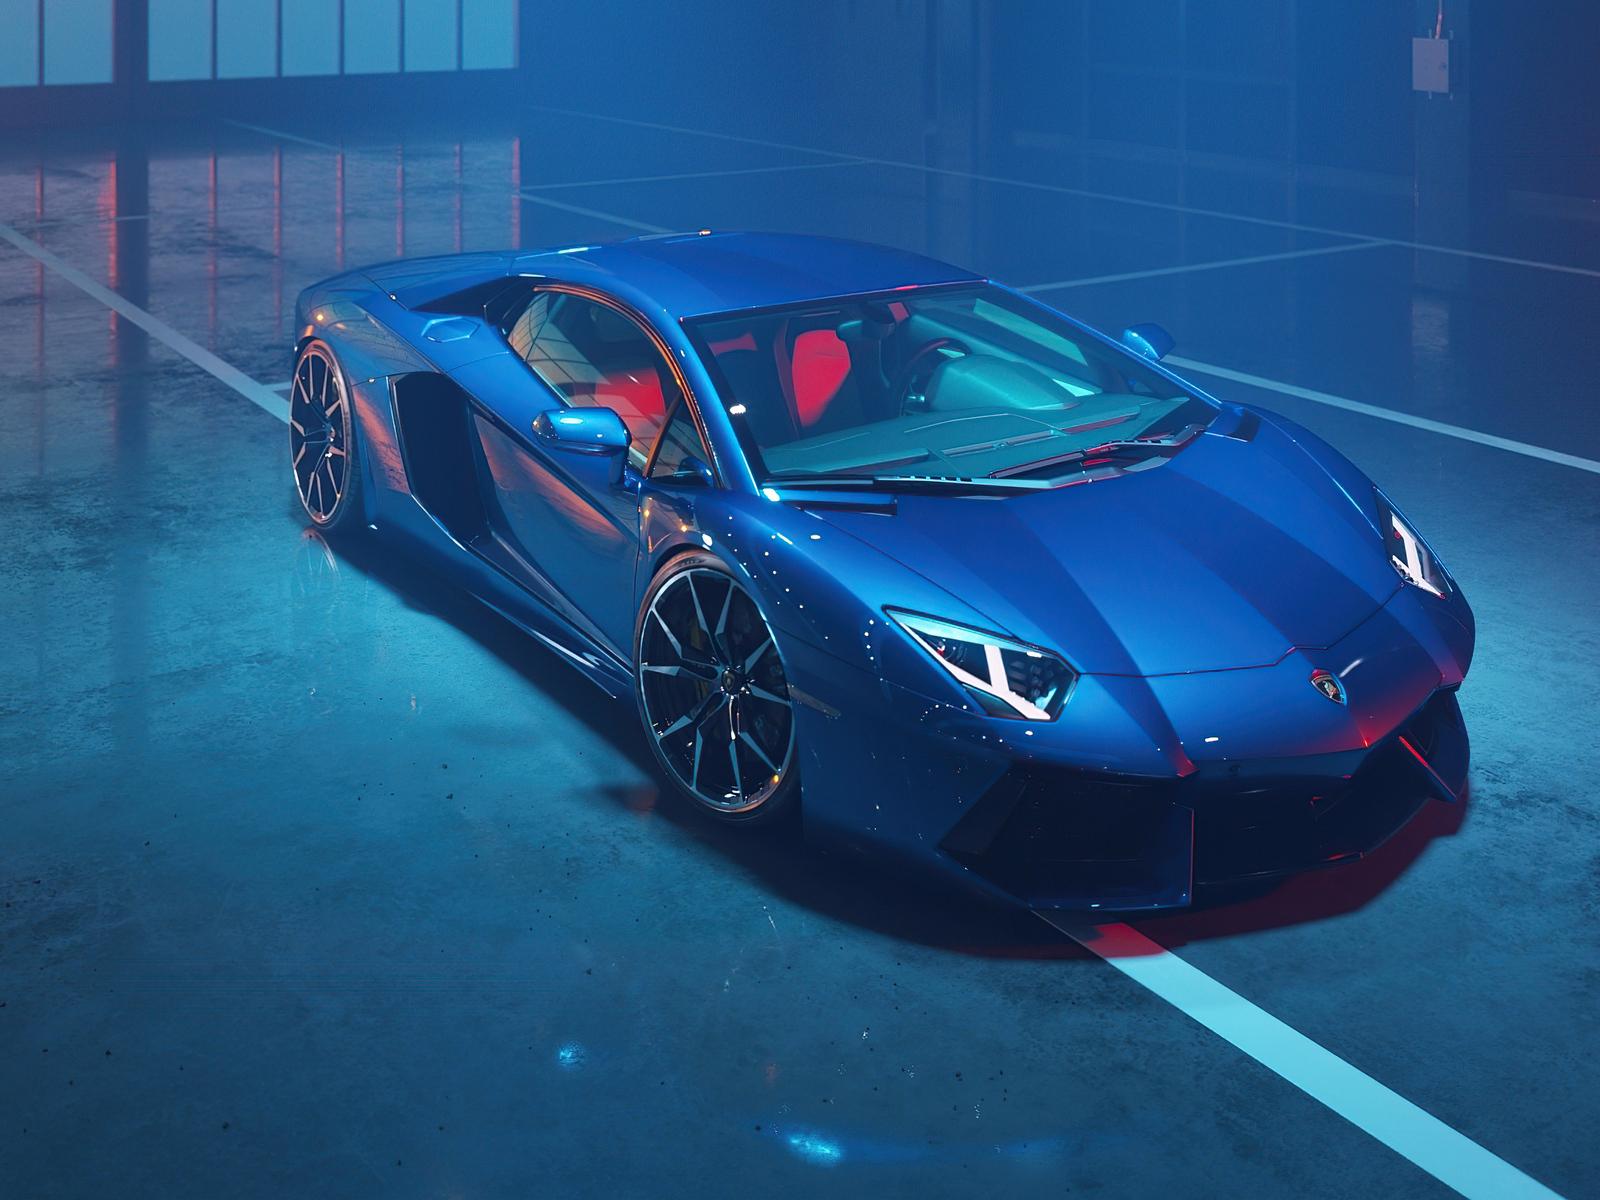 blue-lamborghini-aventador-dione-forged-cgi-4k-gl.jpg